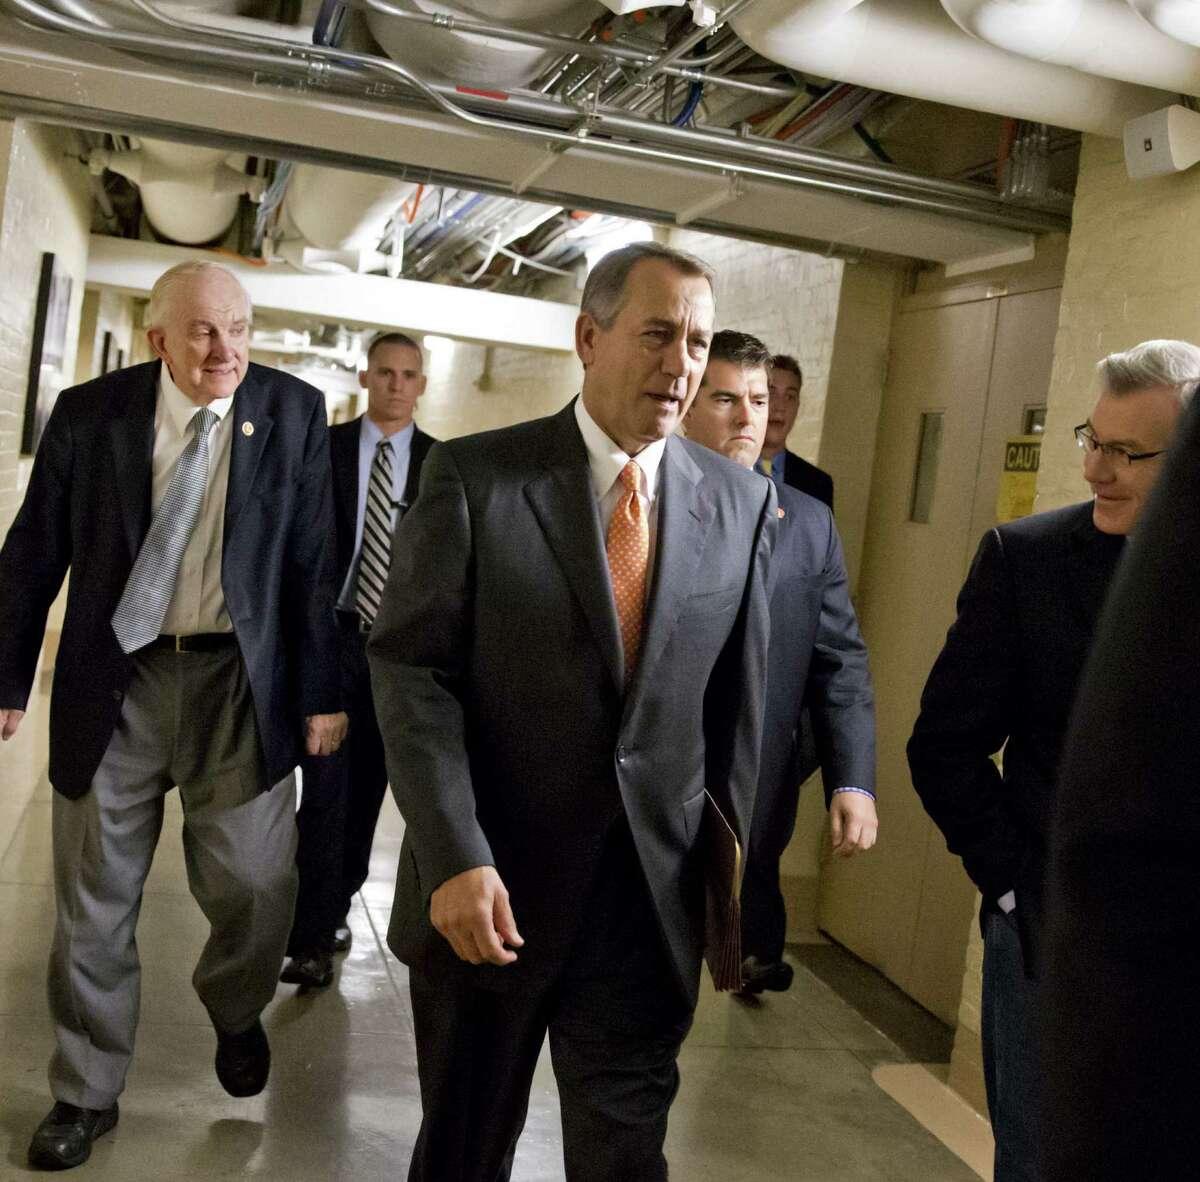 Speaker John Boehner walks with fellow Republicans on the same day House GOP talks with President Barack Obama fail.